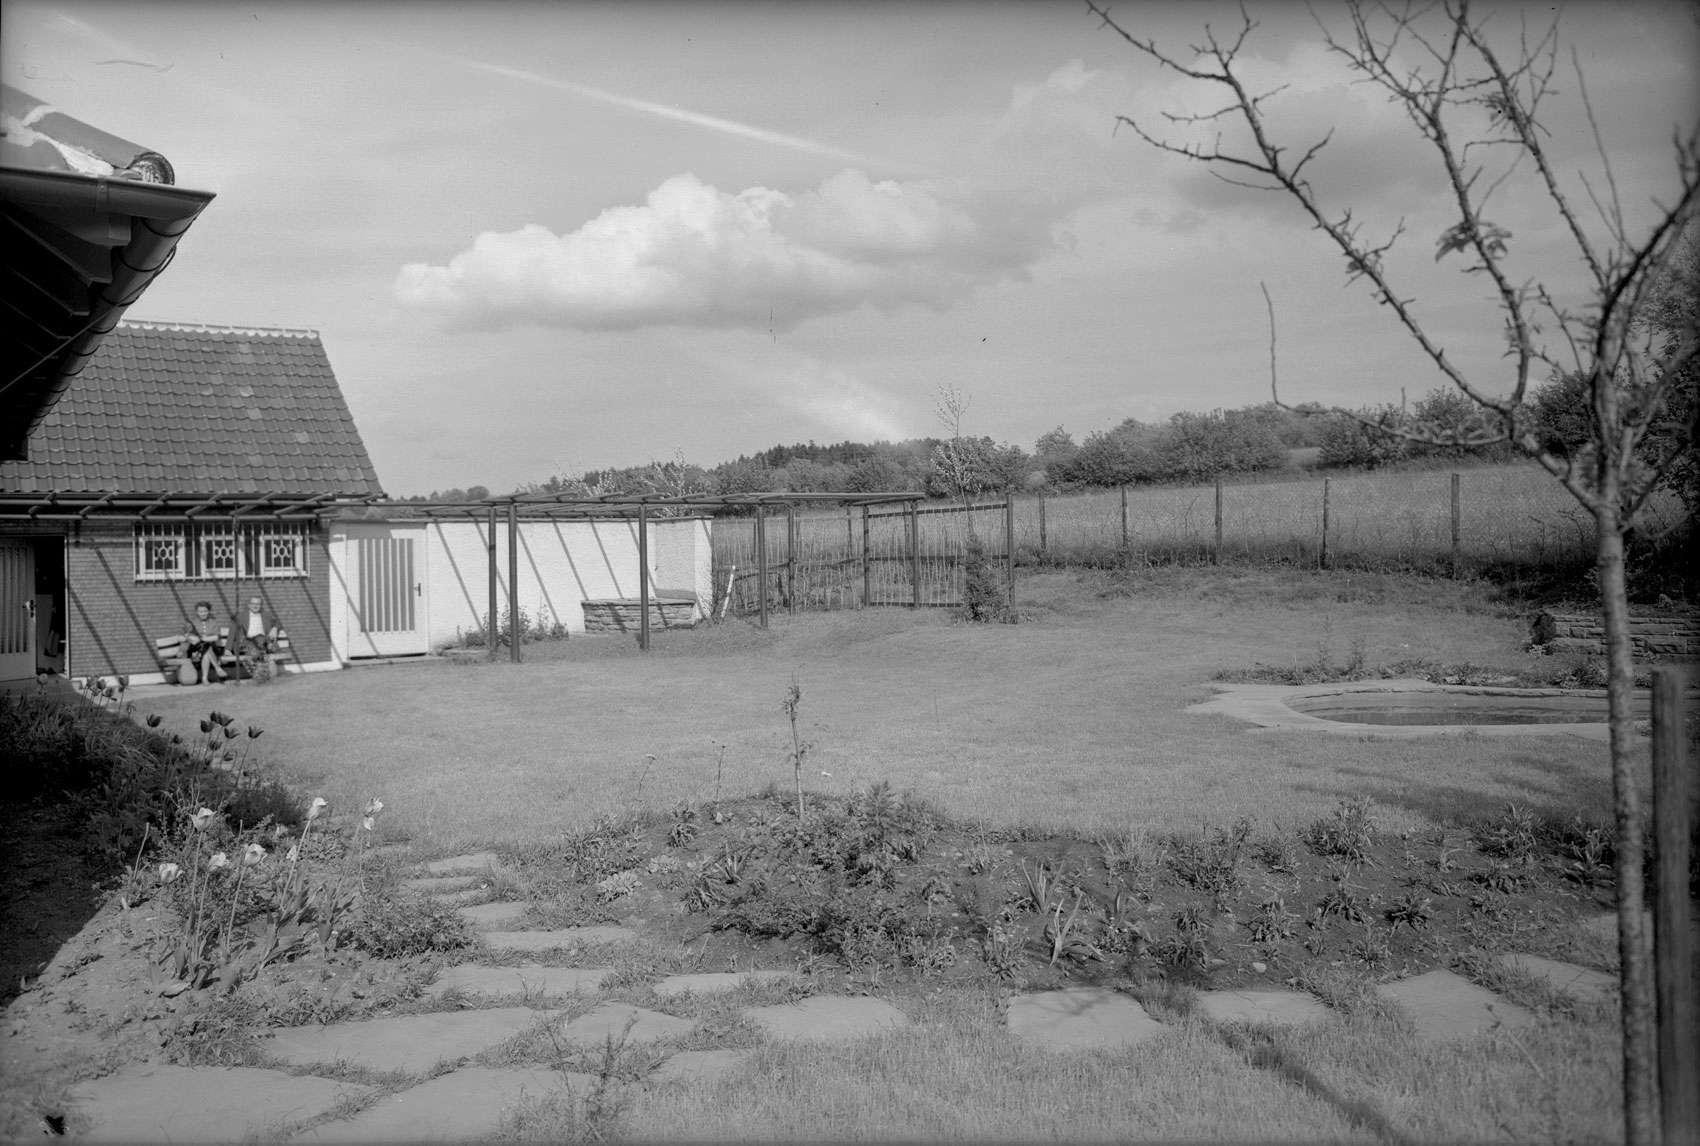 Wildbad / Neuenbürg / Würzbach u.a. 1956, Nr 001